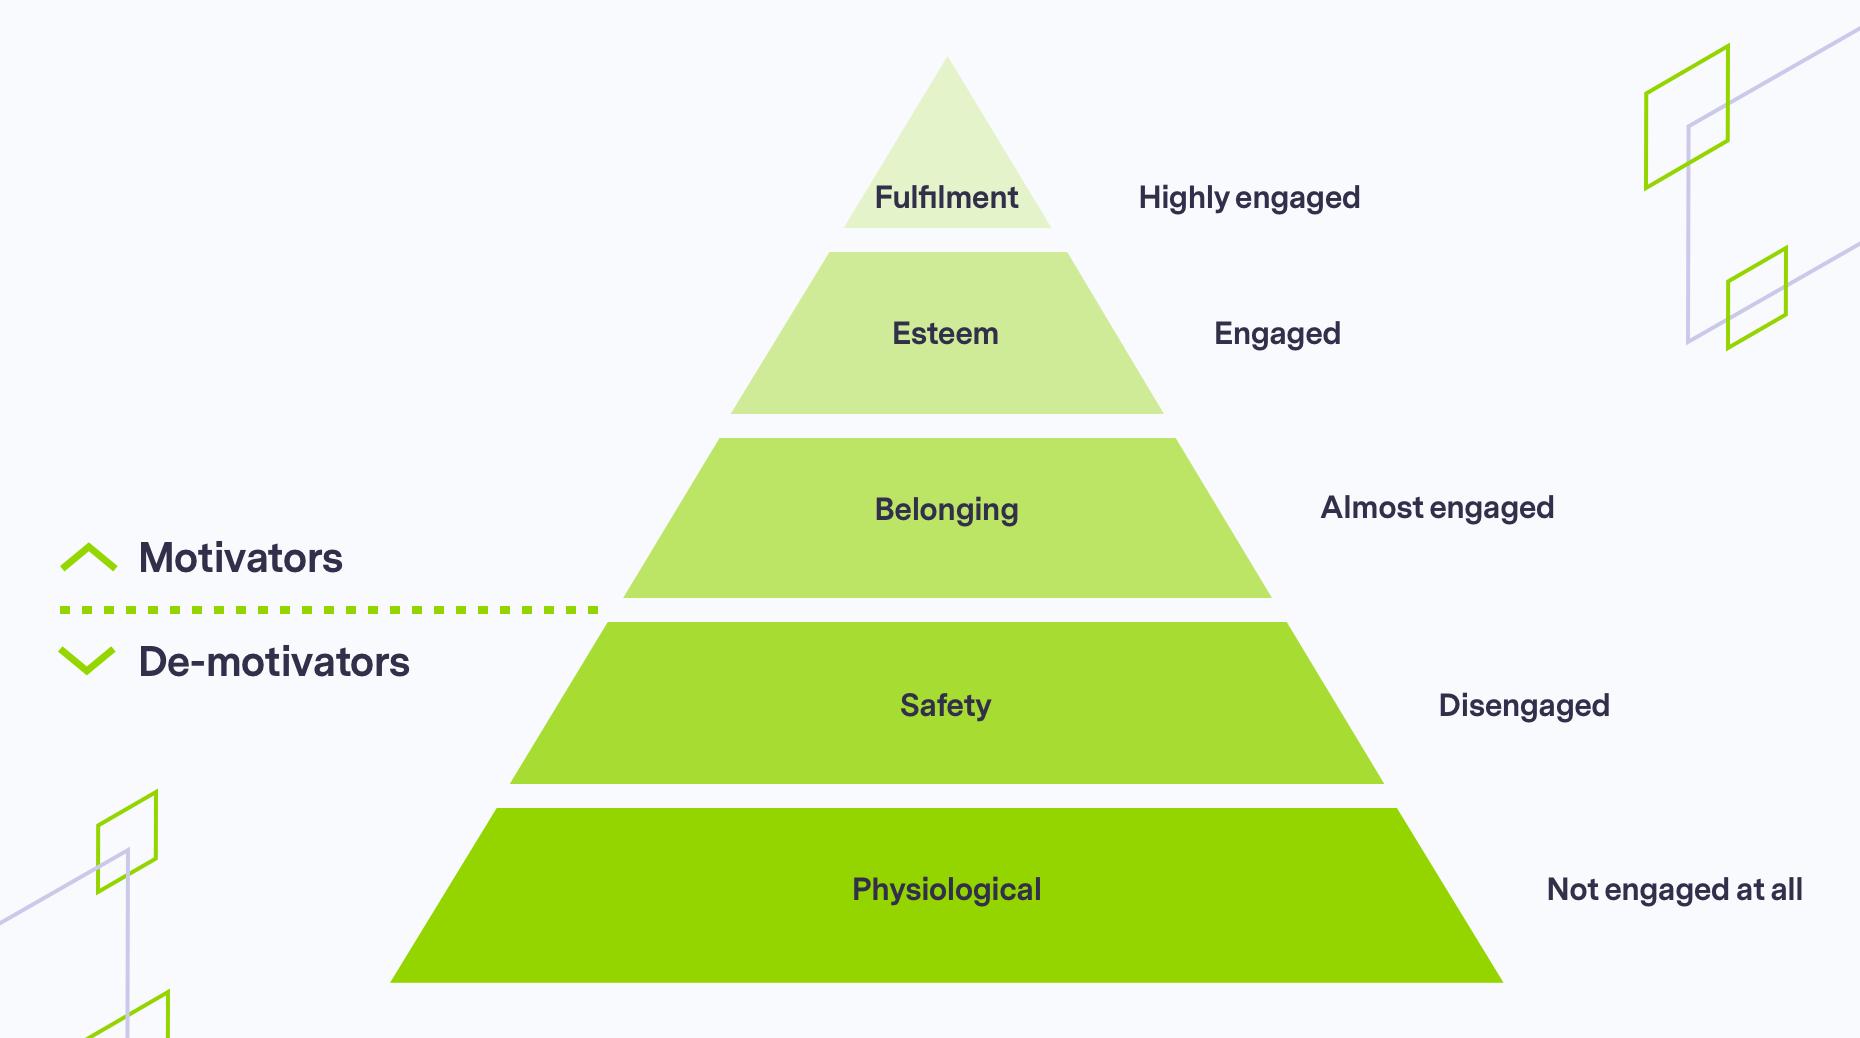 Pyramid do demonstrate employee engagement